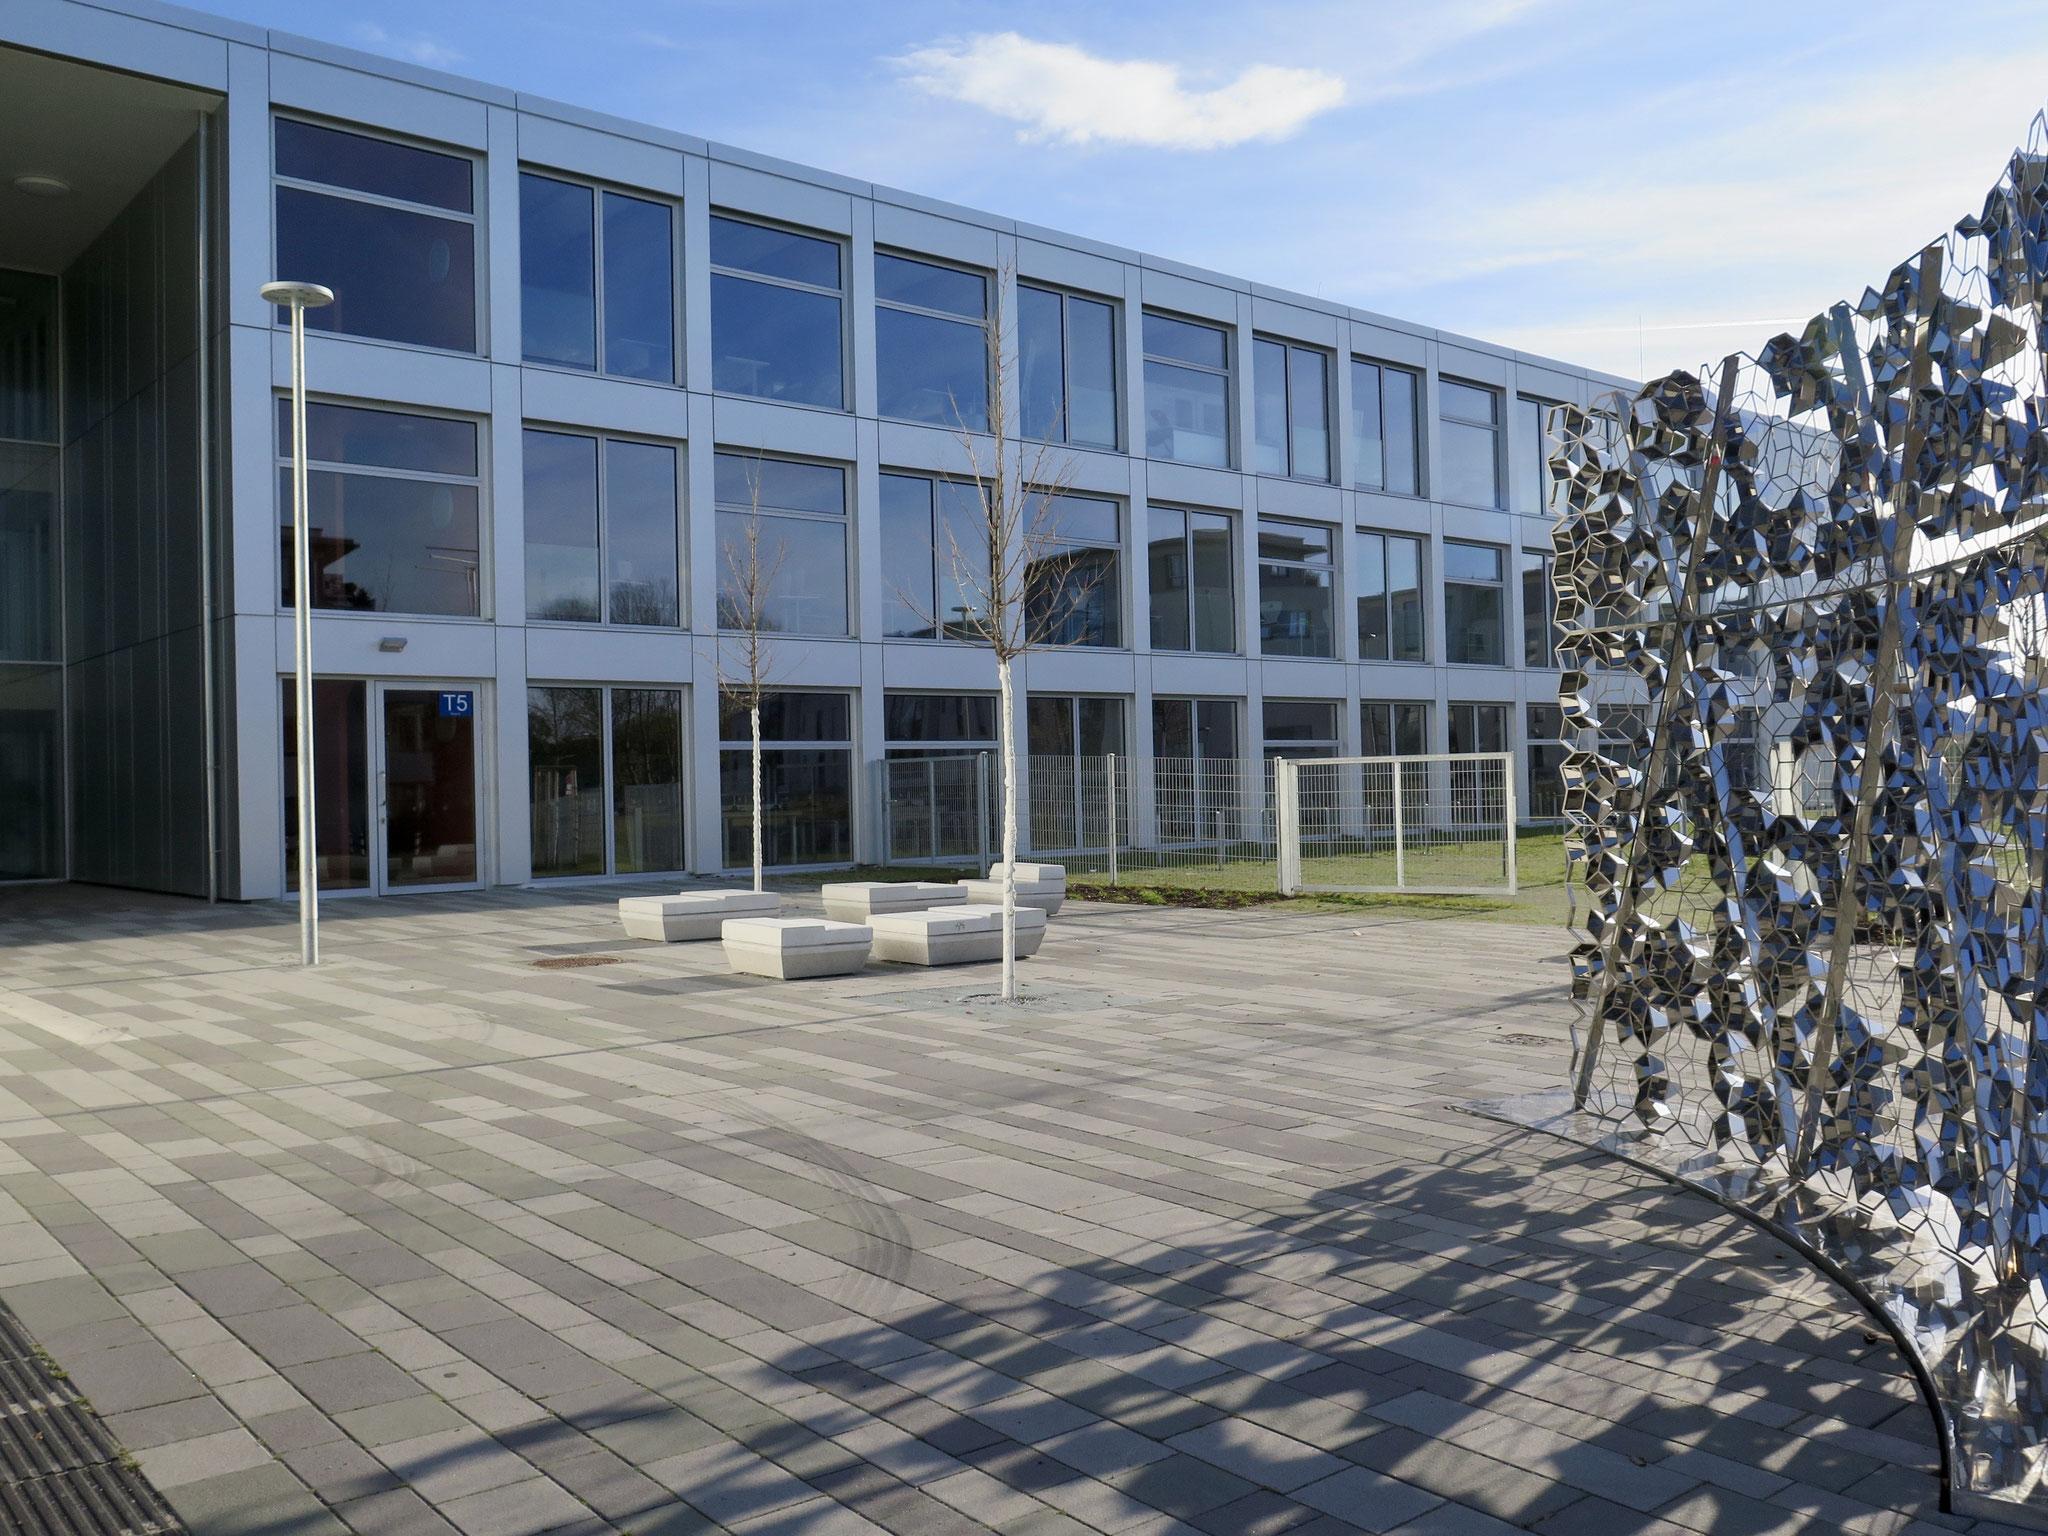 Integrierte Sekundarschule in Mahlsdorf (An der Schule 41)